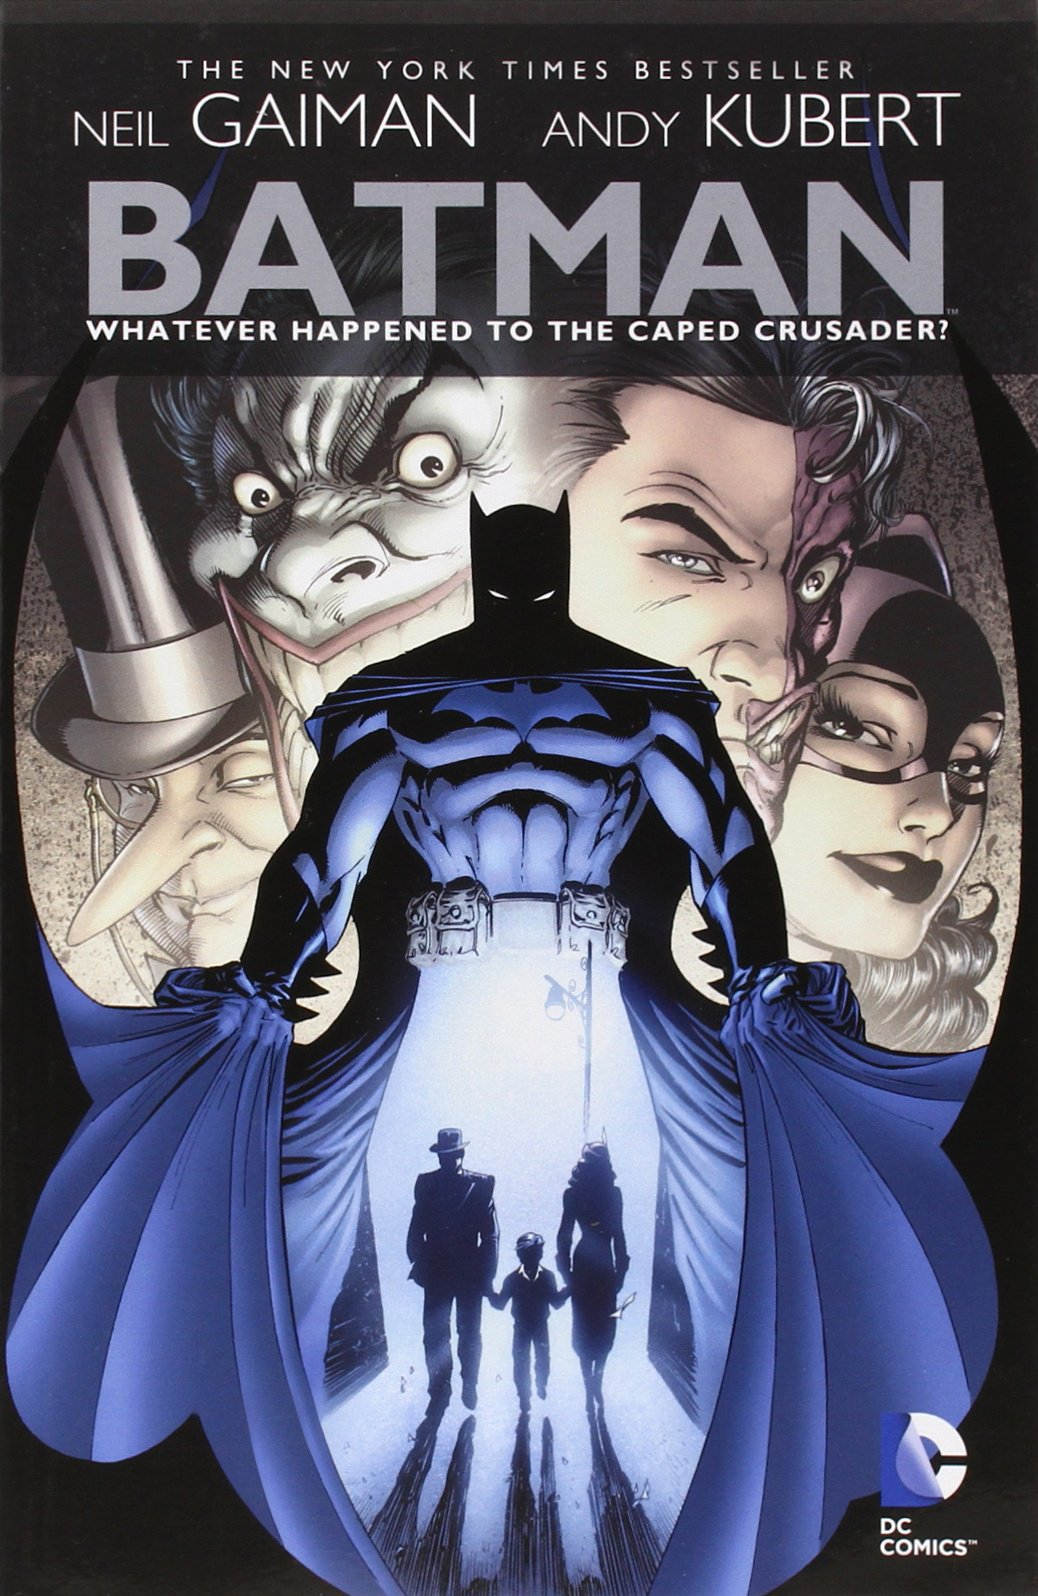 Batman: What Happened To The Caped Crusader? ile ilgili görsel sonucu